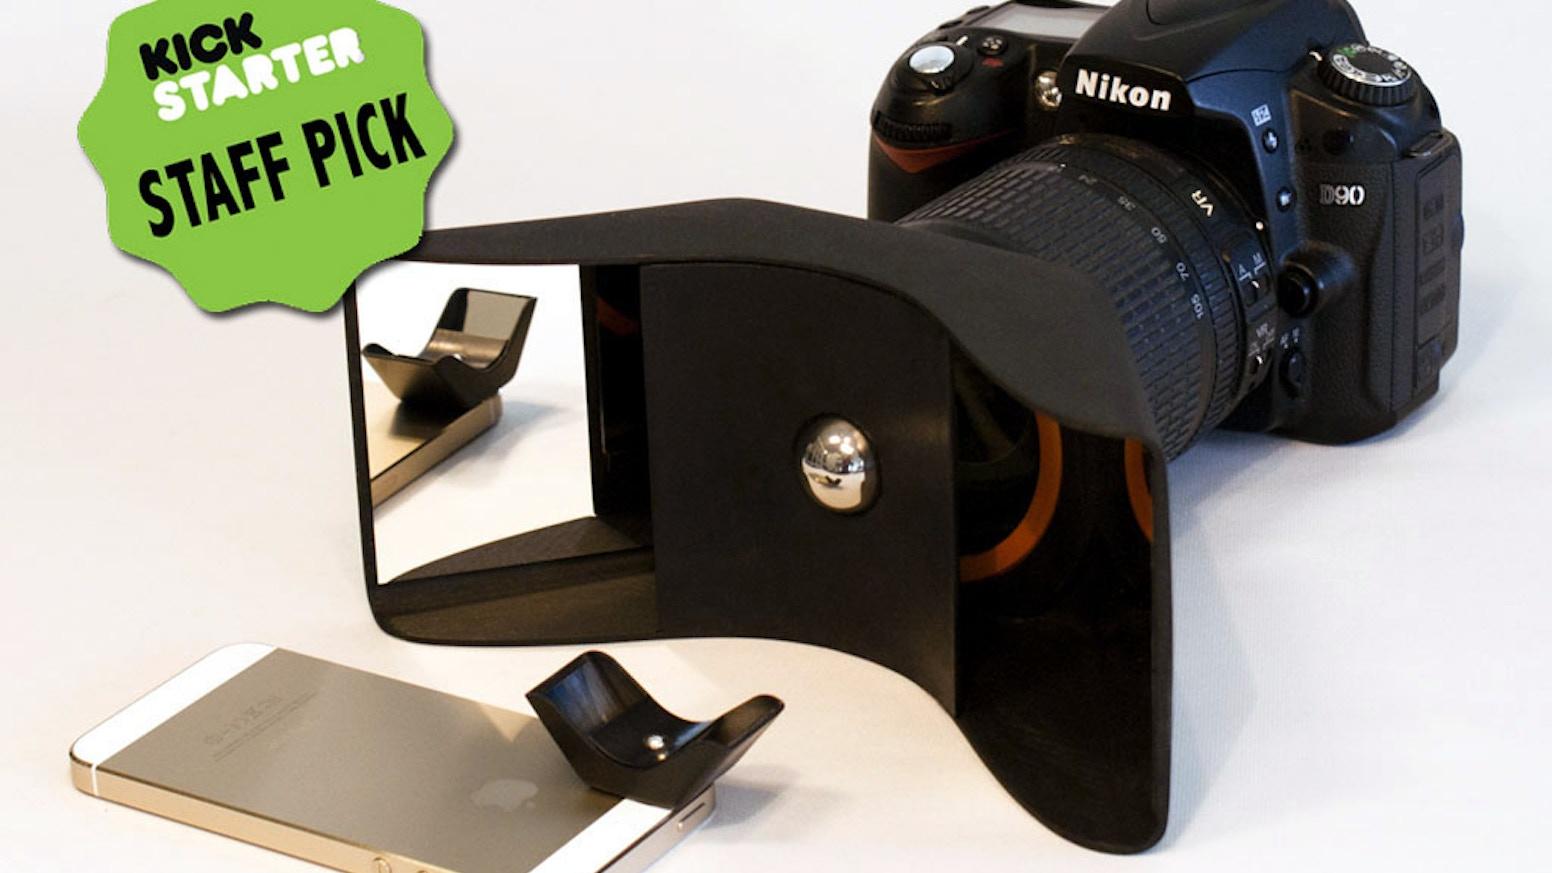 Kúla turns normal cameras into 3D cameras with Kúla Deeper for SLR's and Kúla Bebe for smartphones.